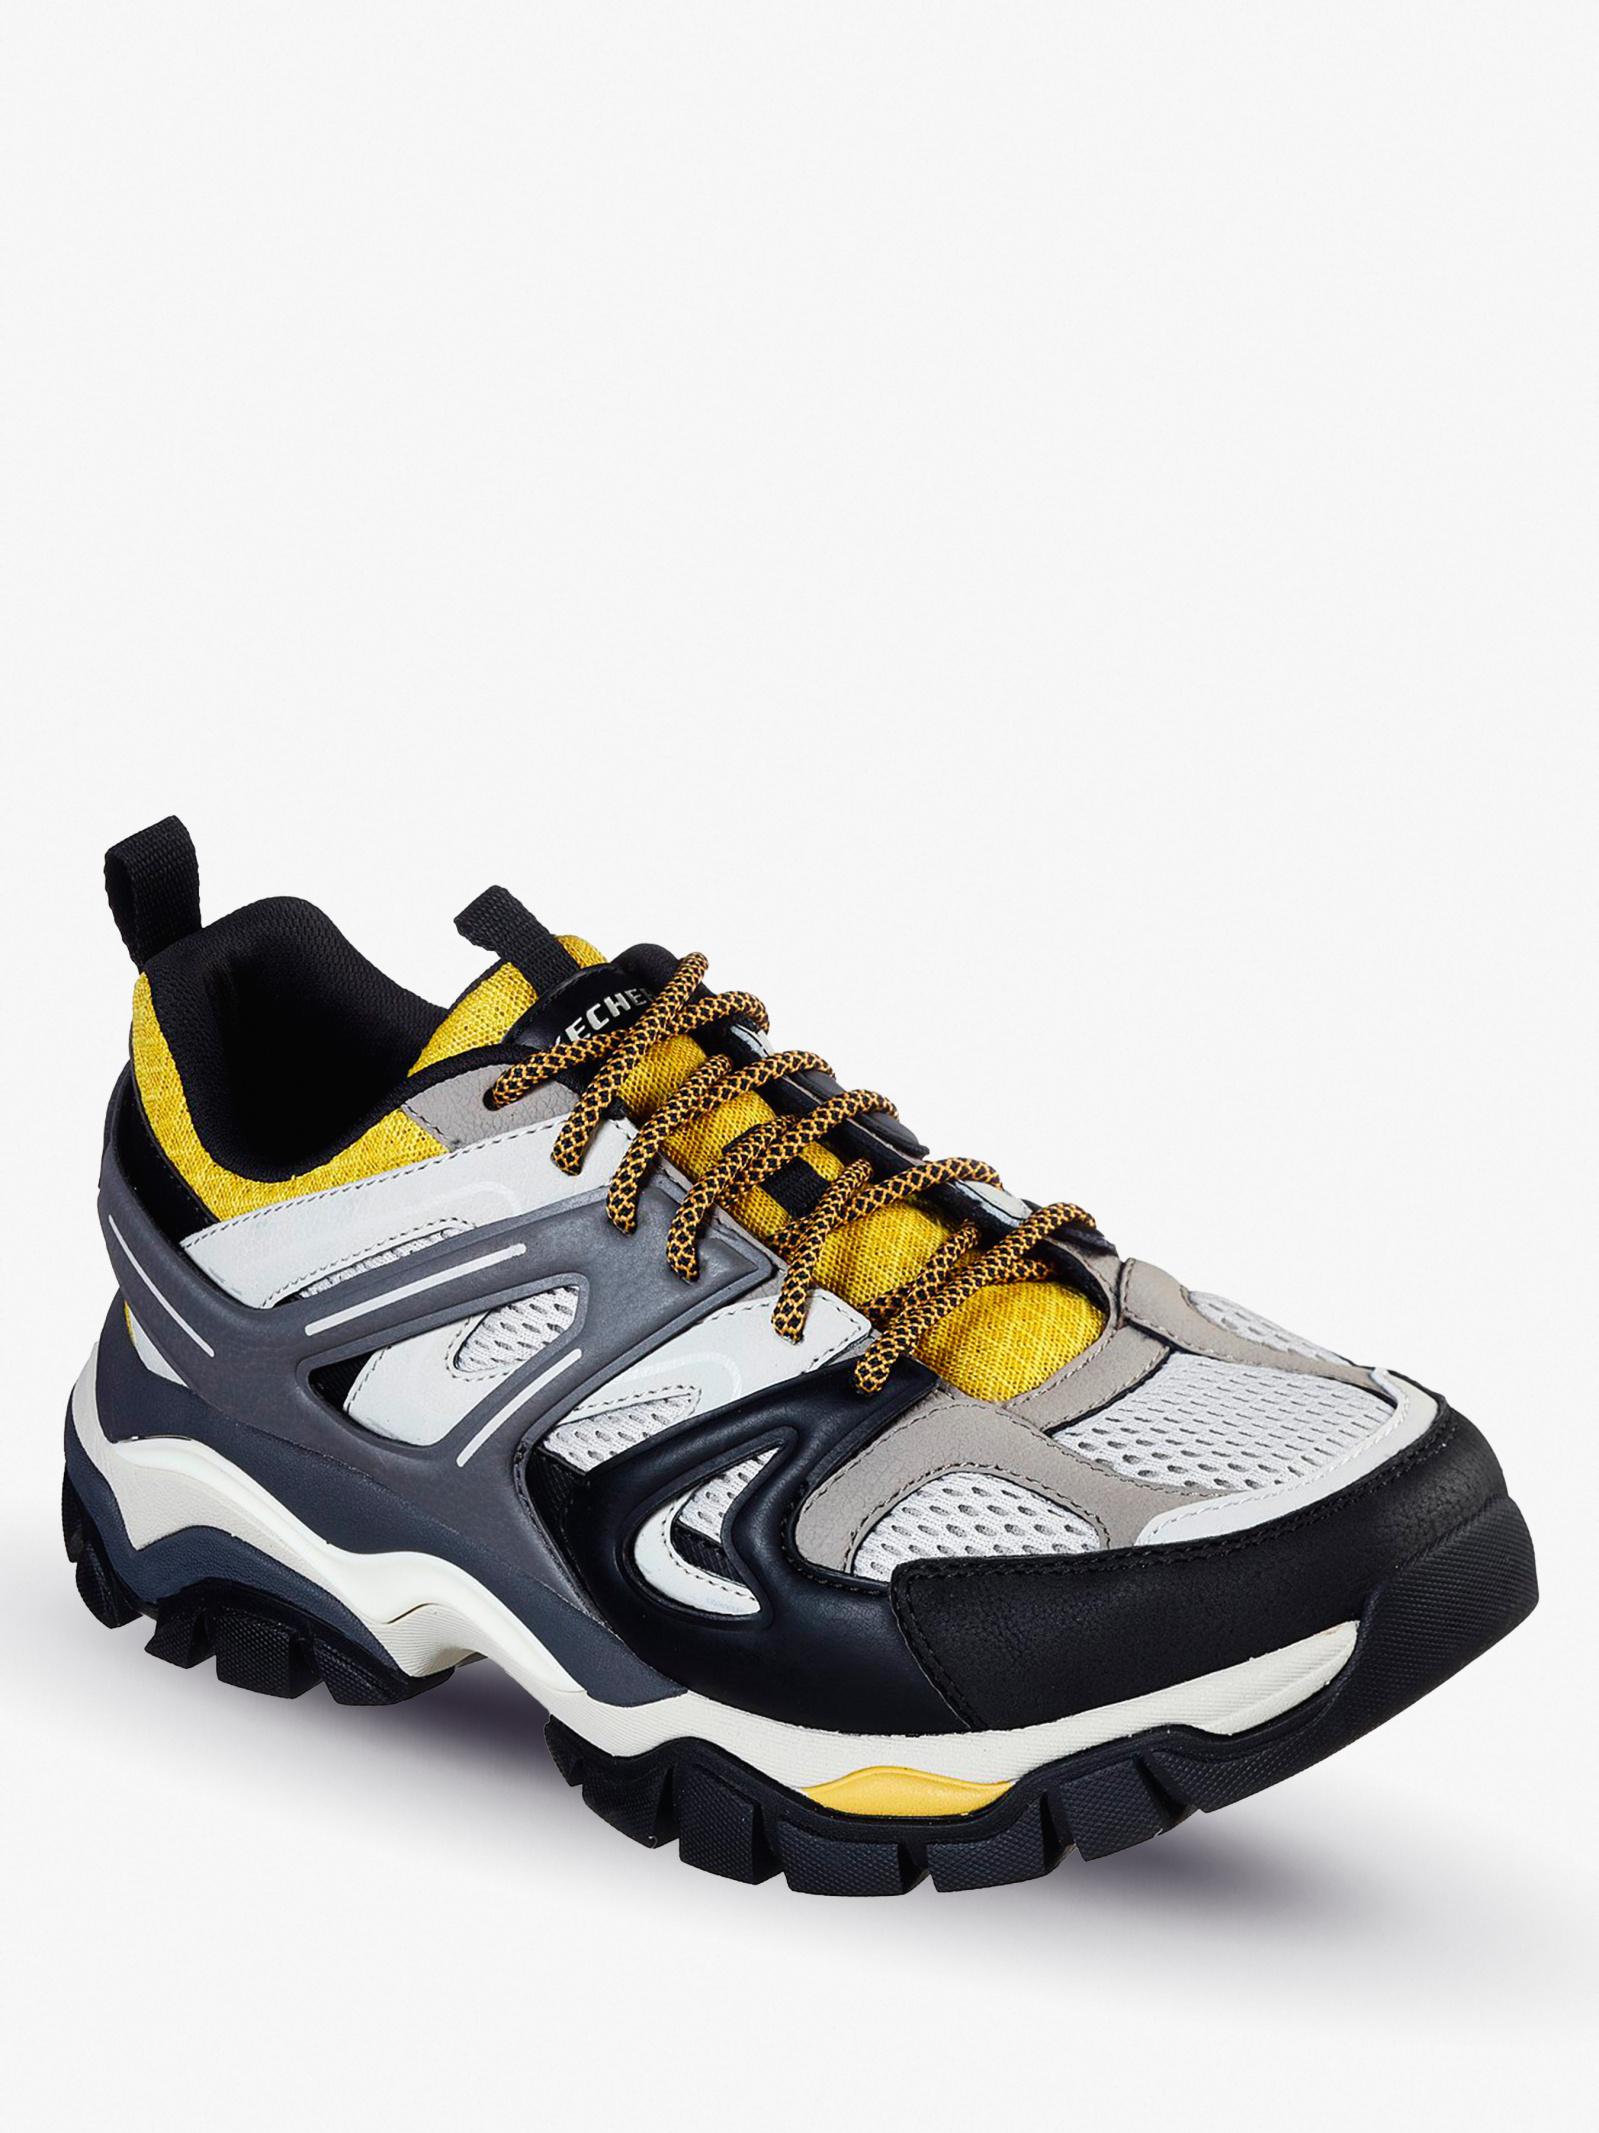 Кроссовки для мужчин Skechers USA Streetwear 66255 LTGY размерная сетка обуви, 2017